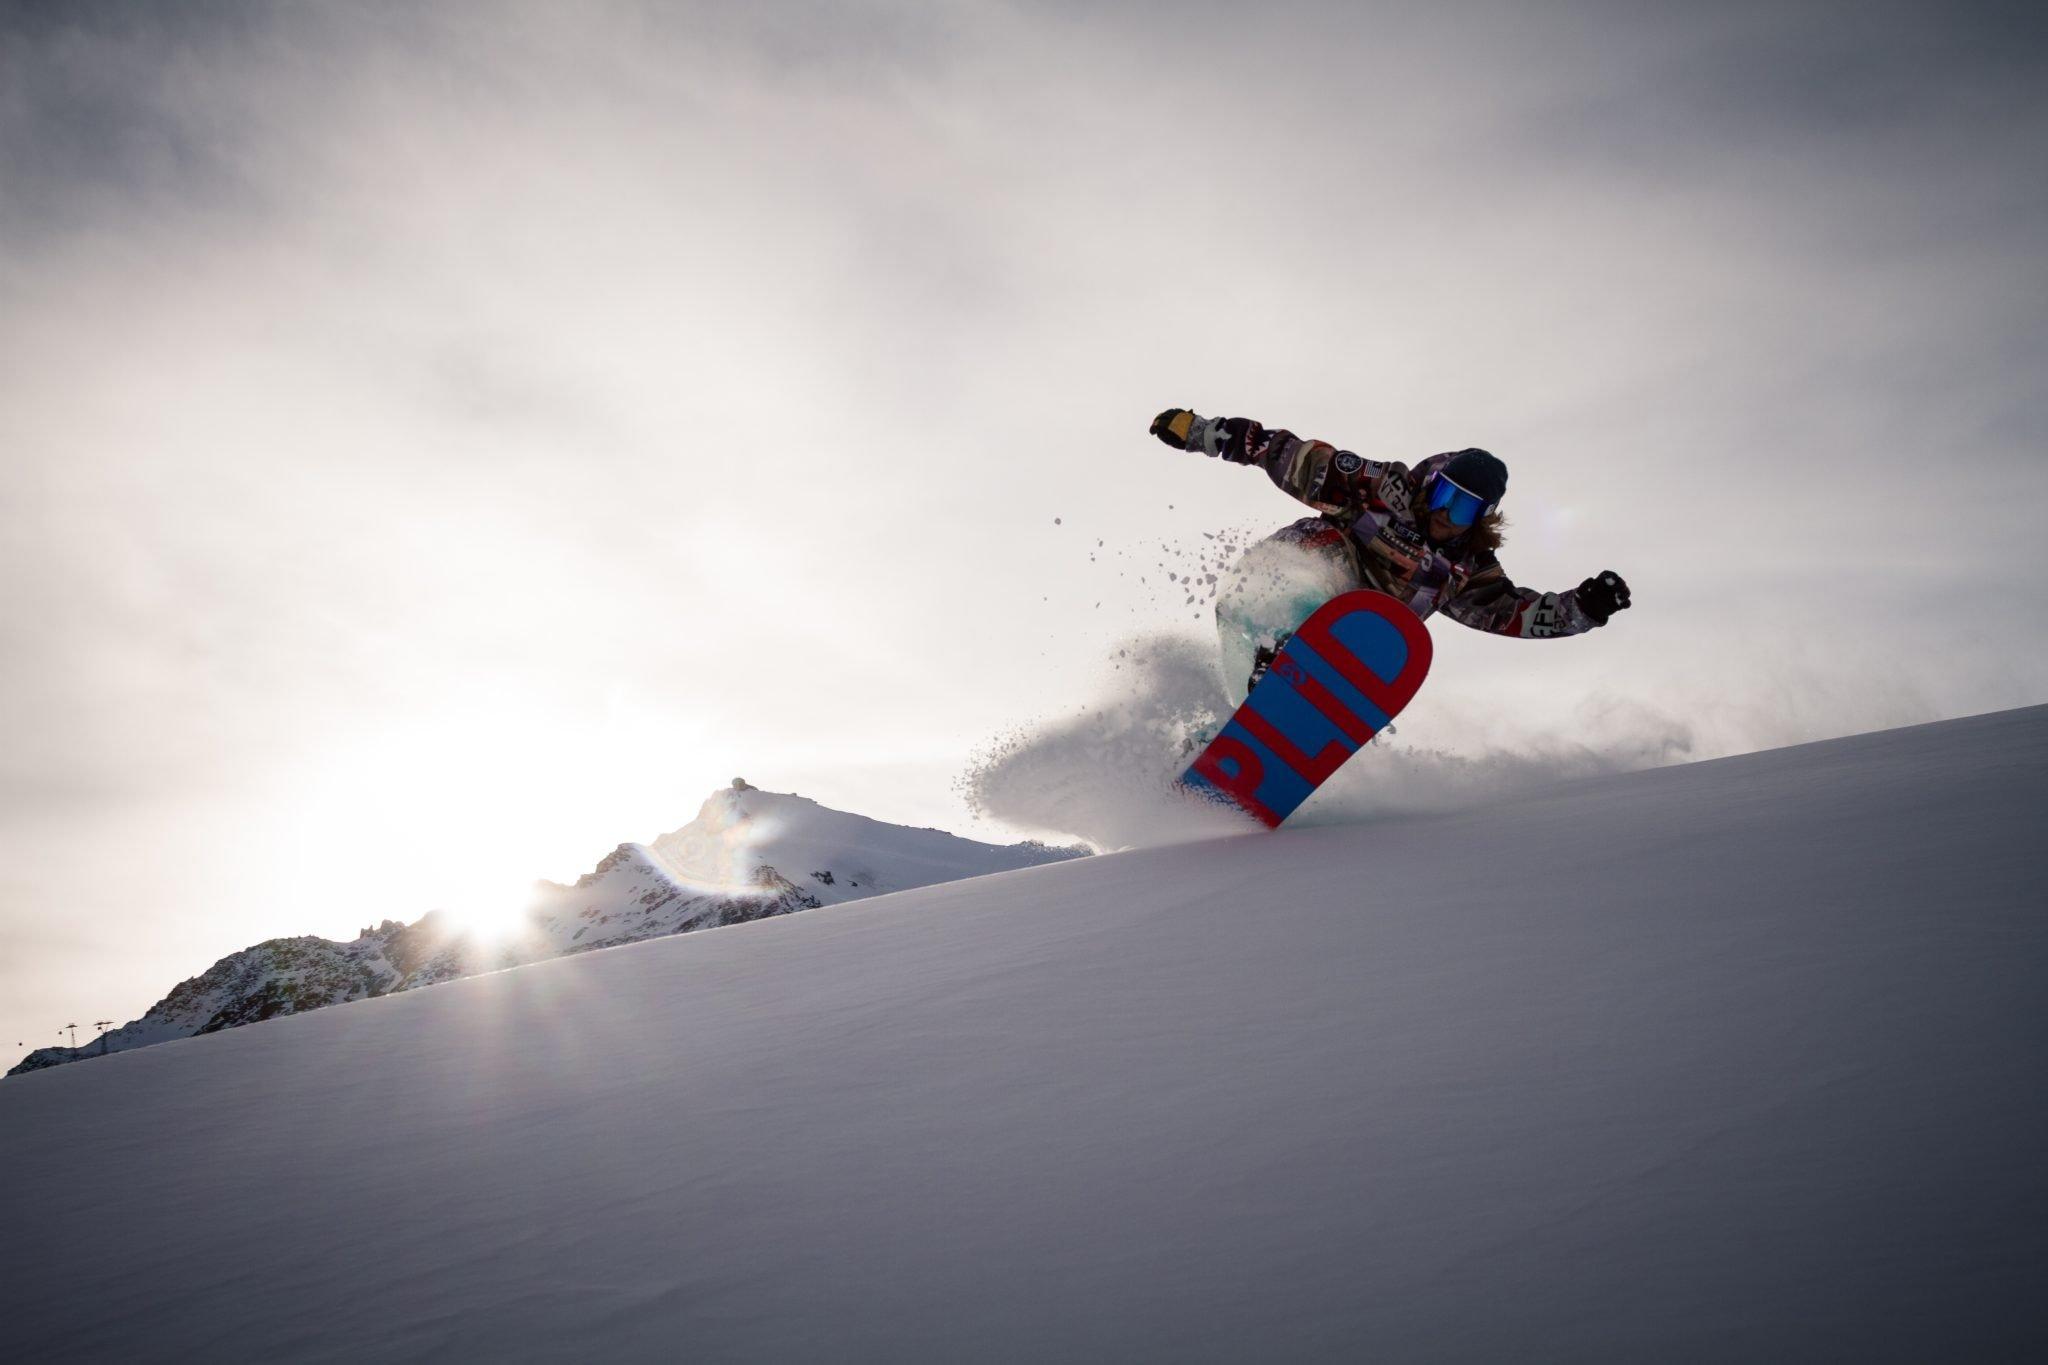 Equipment to buy for the ski season